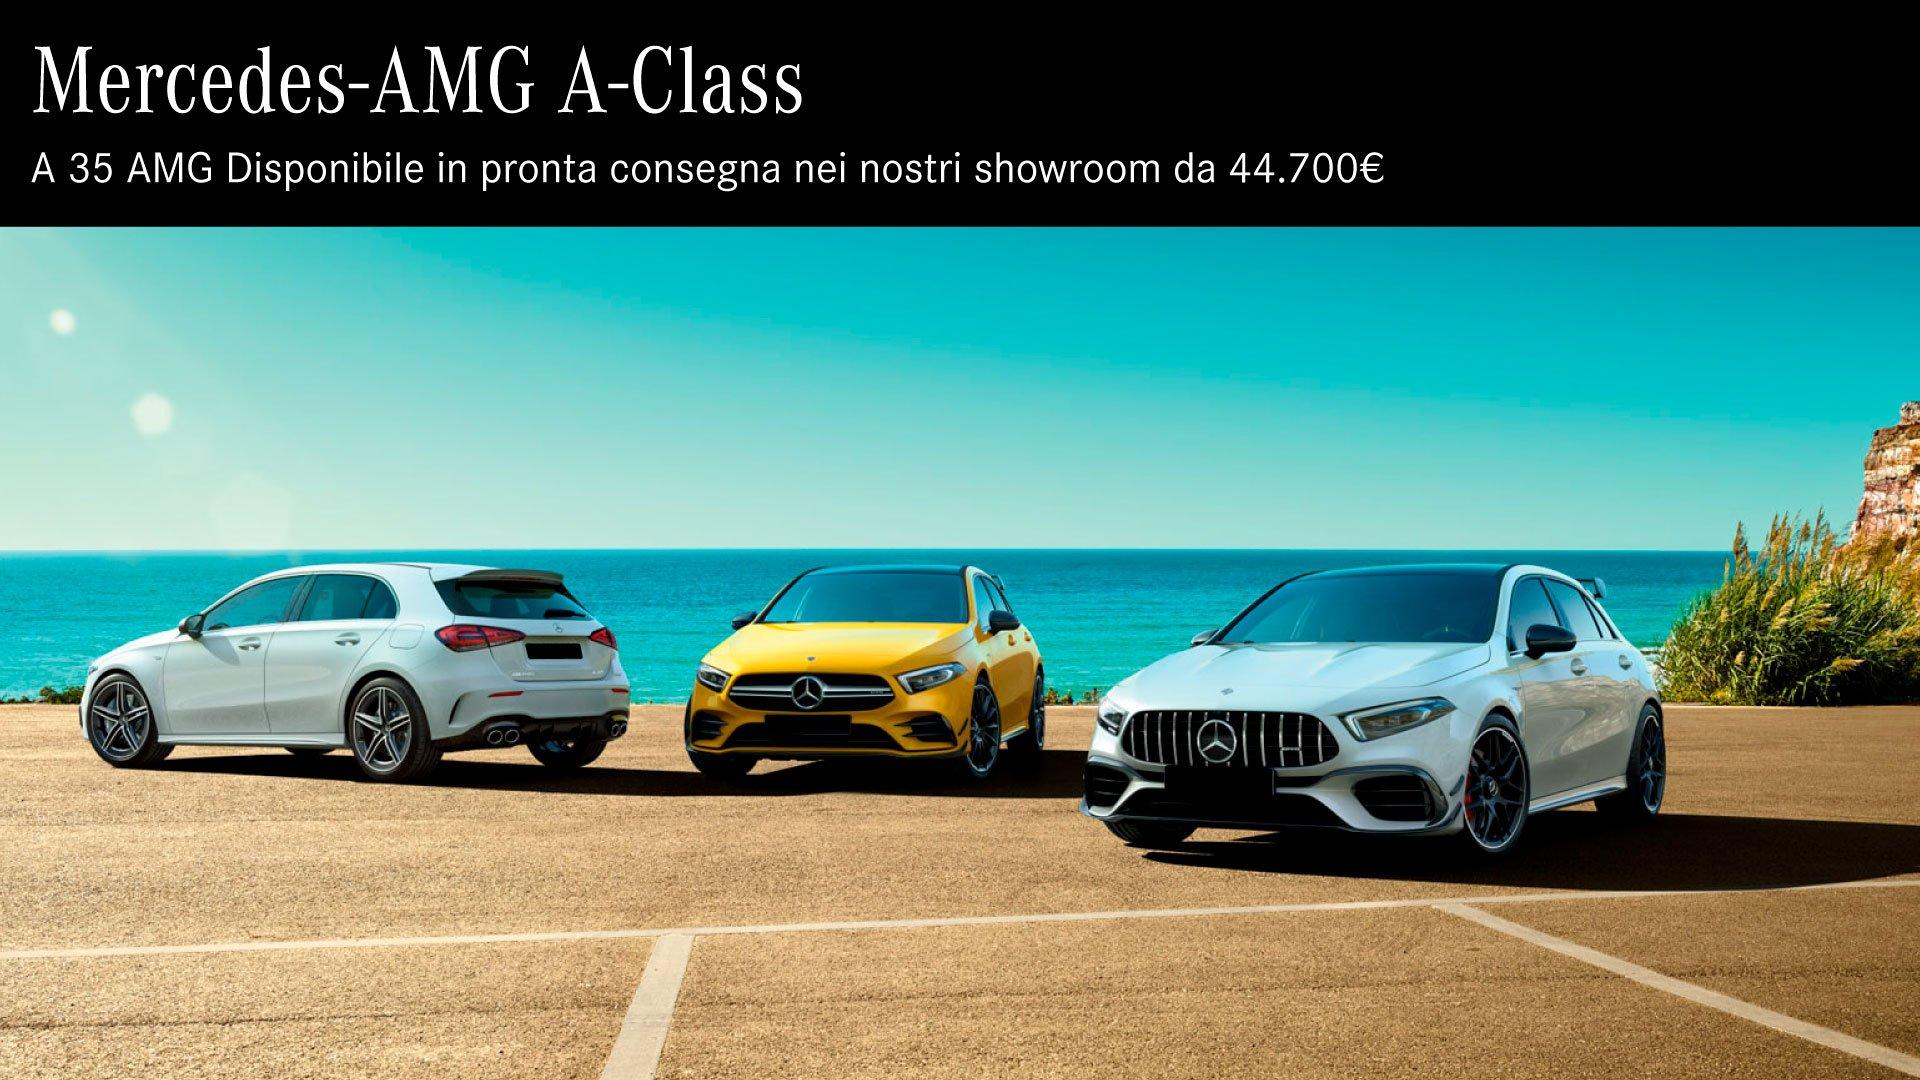 Mercedes-AMG Classe A